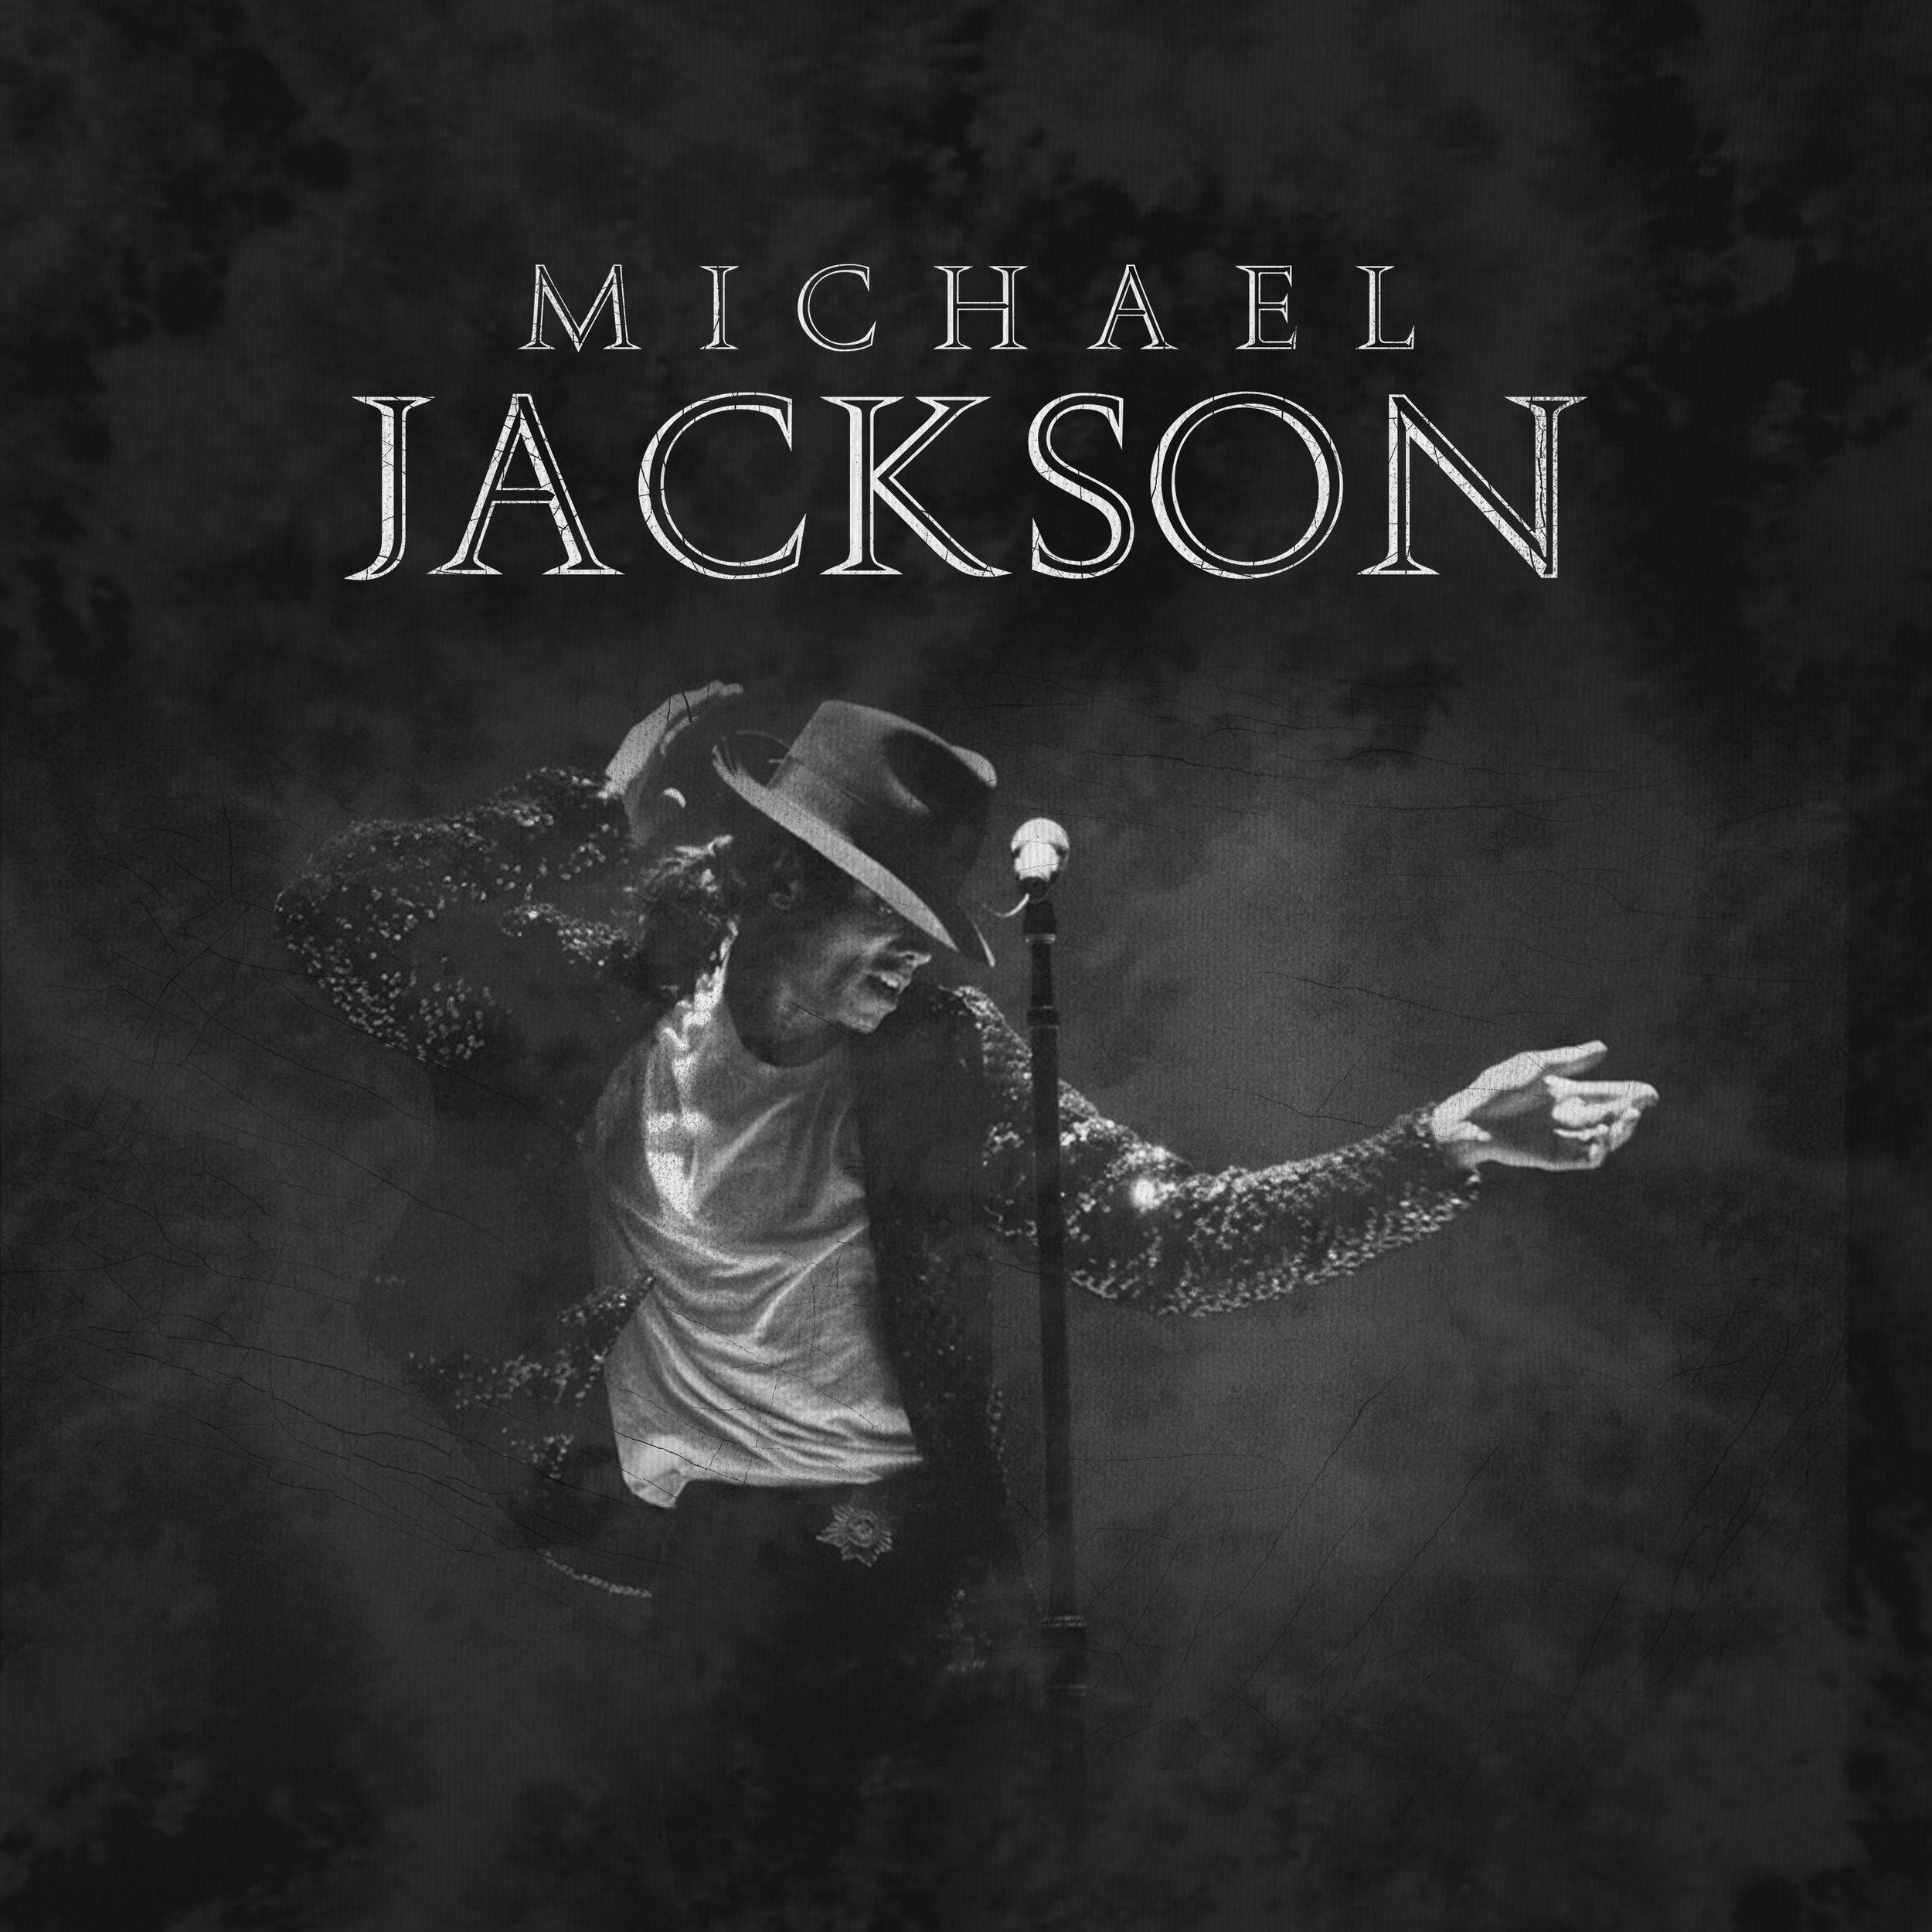 michael-jackson-pose.jpg